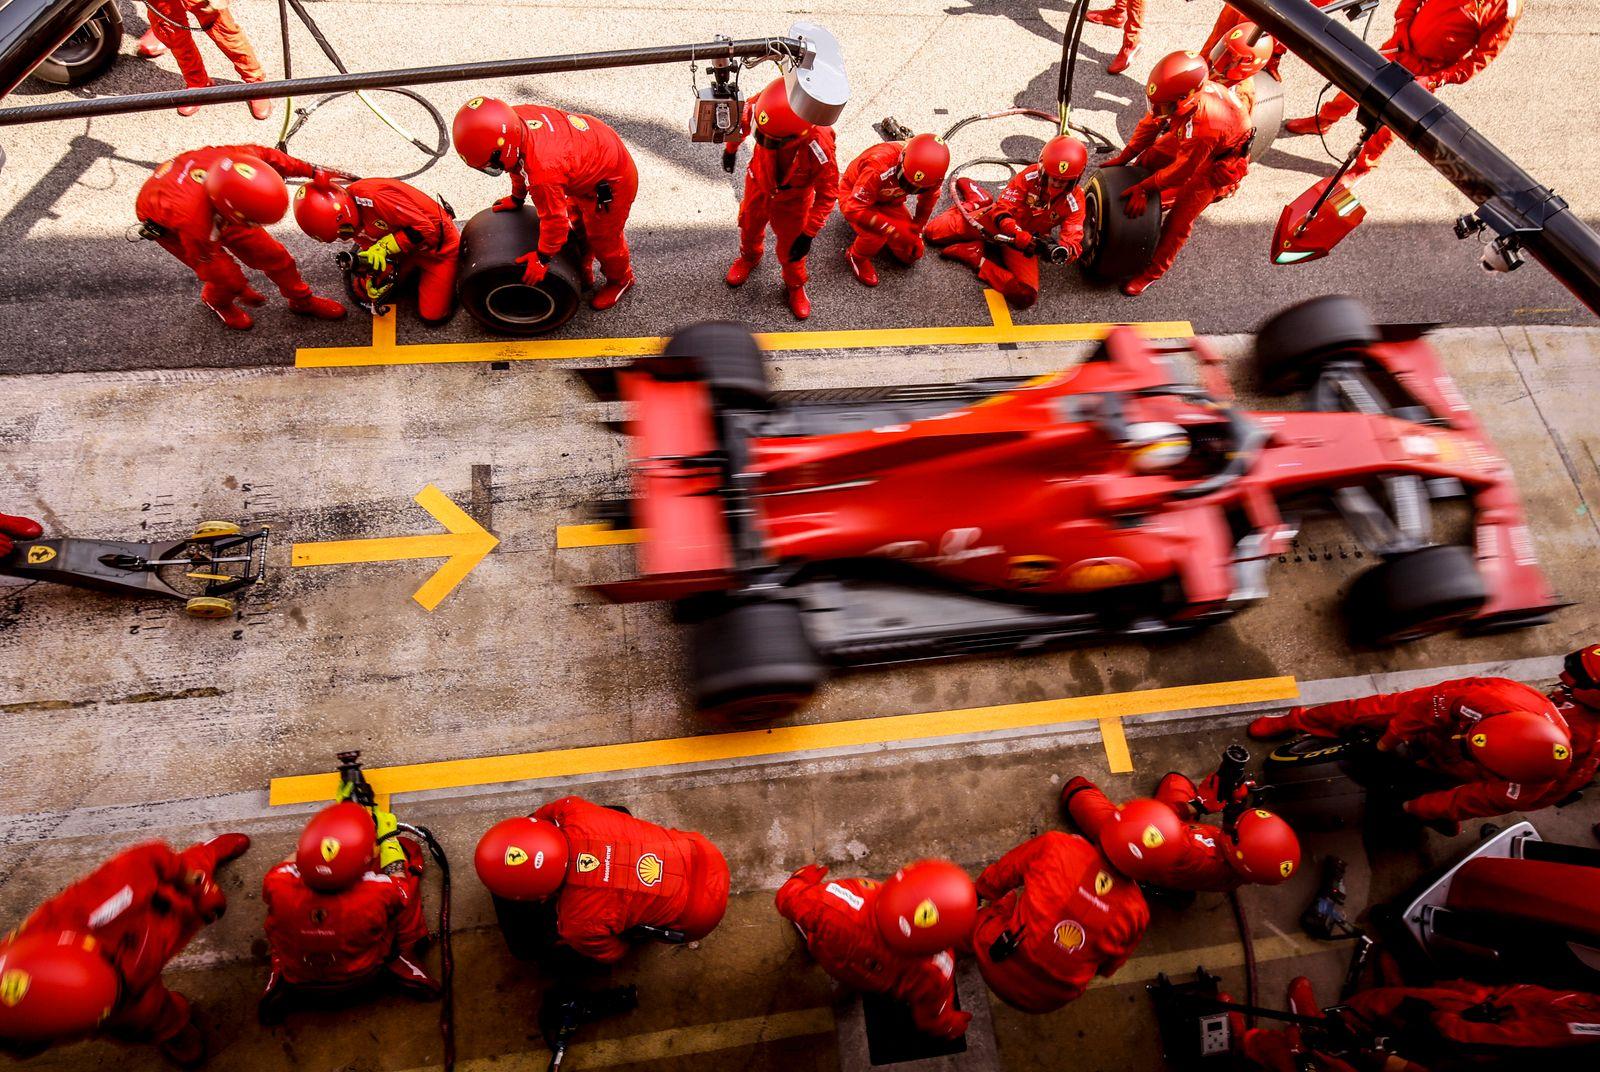 Motorsports: FIA Formula One World Championship, WM, Weltmeisterschaft 2020, Grand Prix of Spain, 5 Sebastian Vettel (G